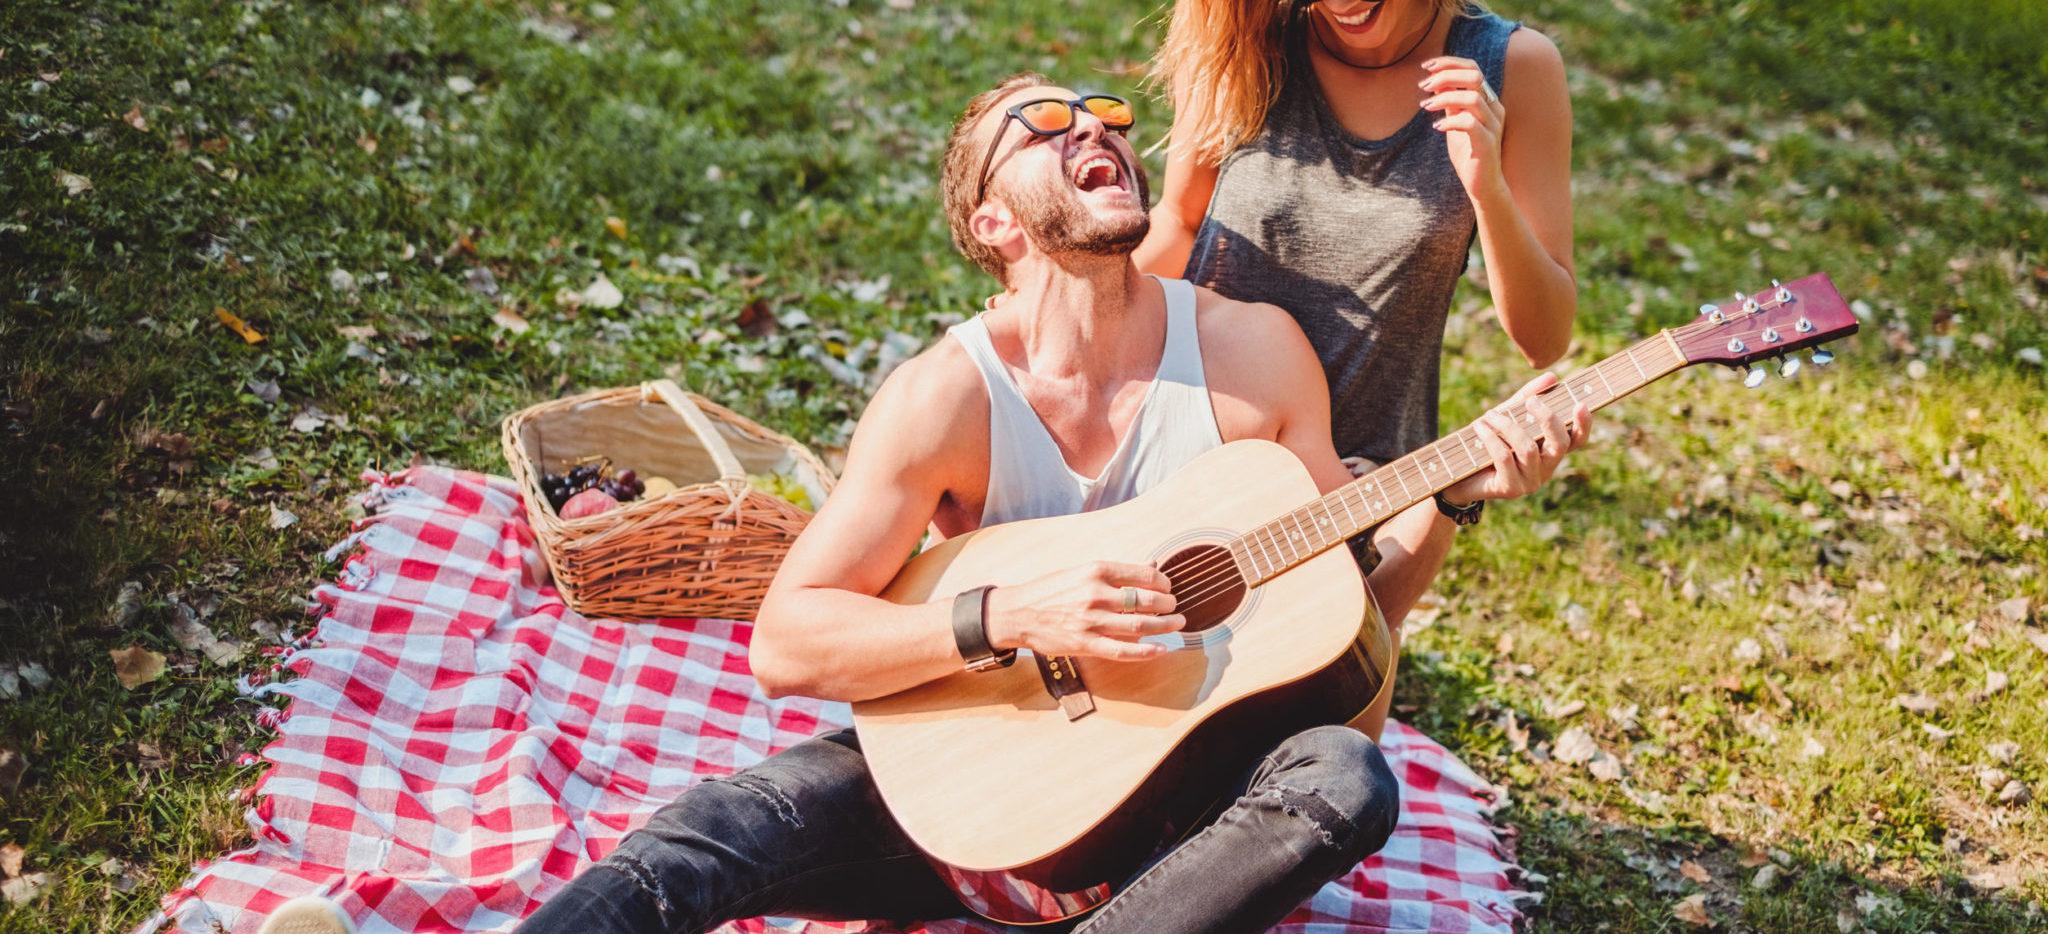 learn spanish songs